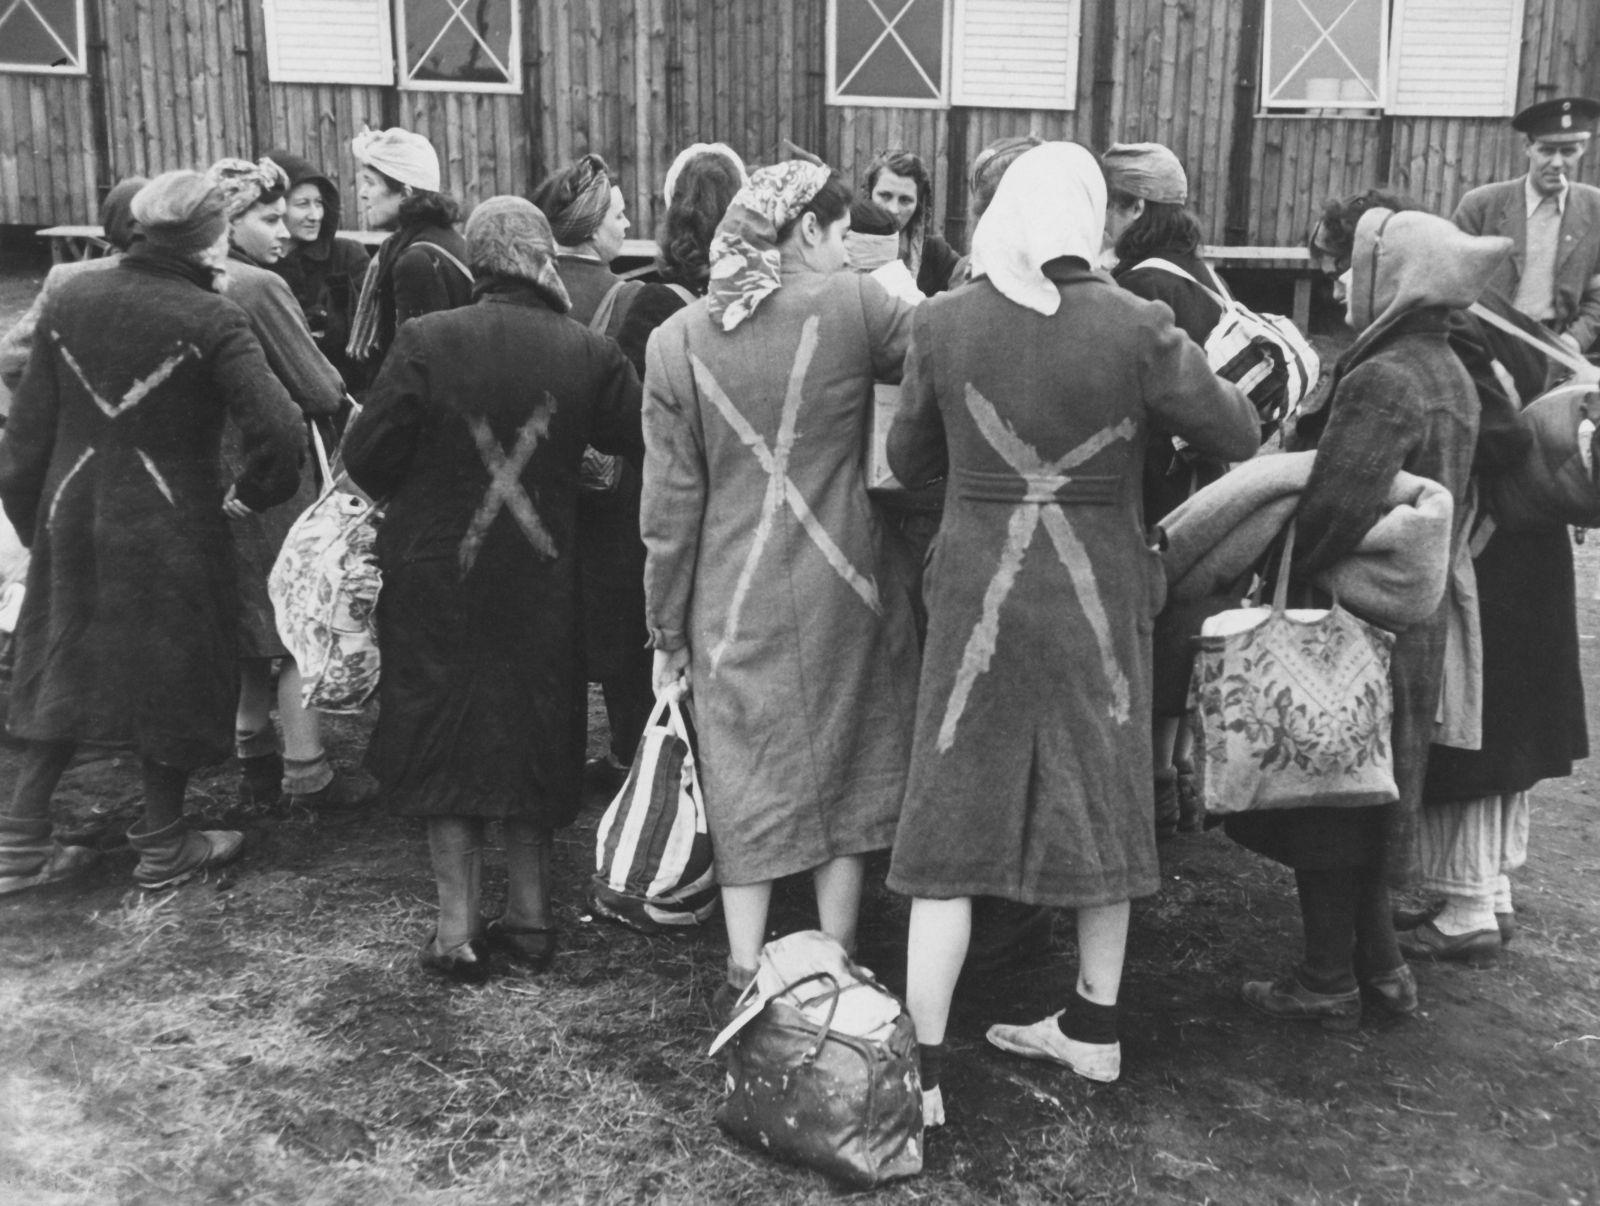 women-ravensbruck-concentration-camp